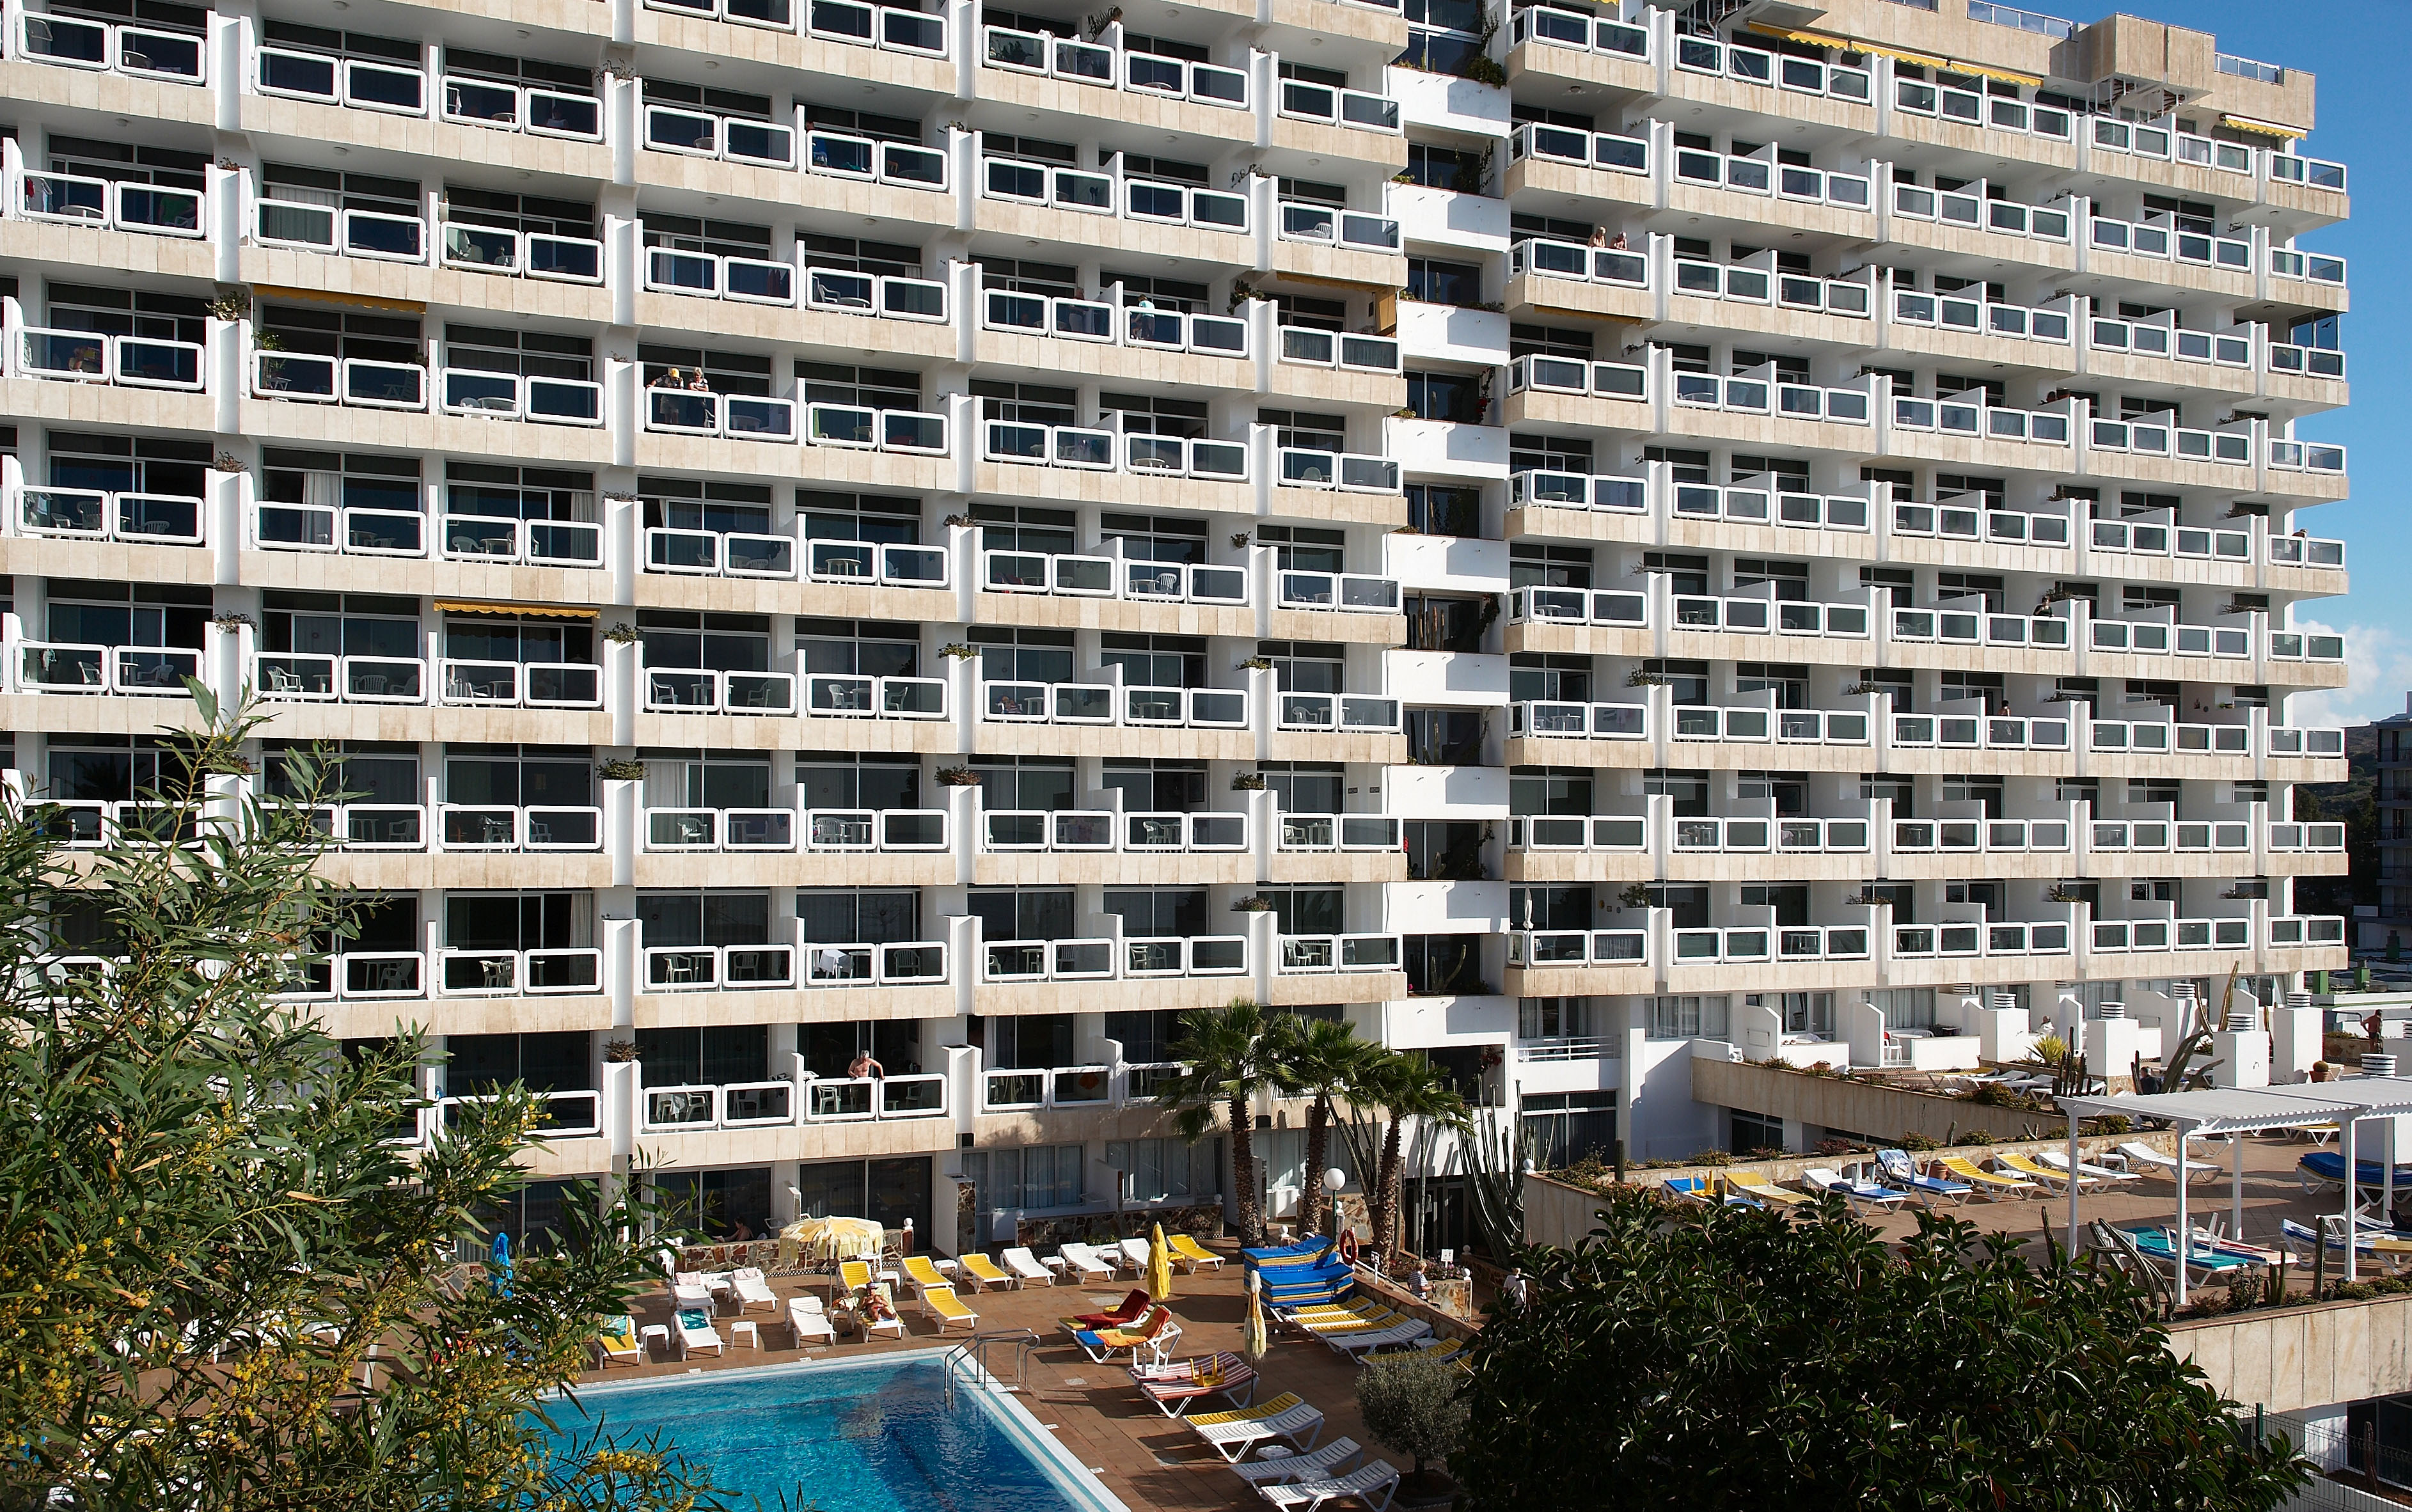 Playa Del Ingles Hotel Park Tropikal